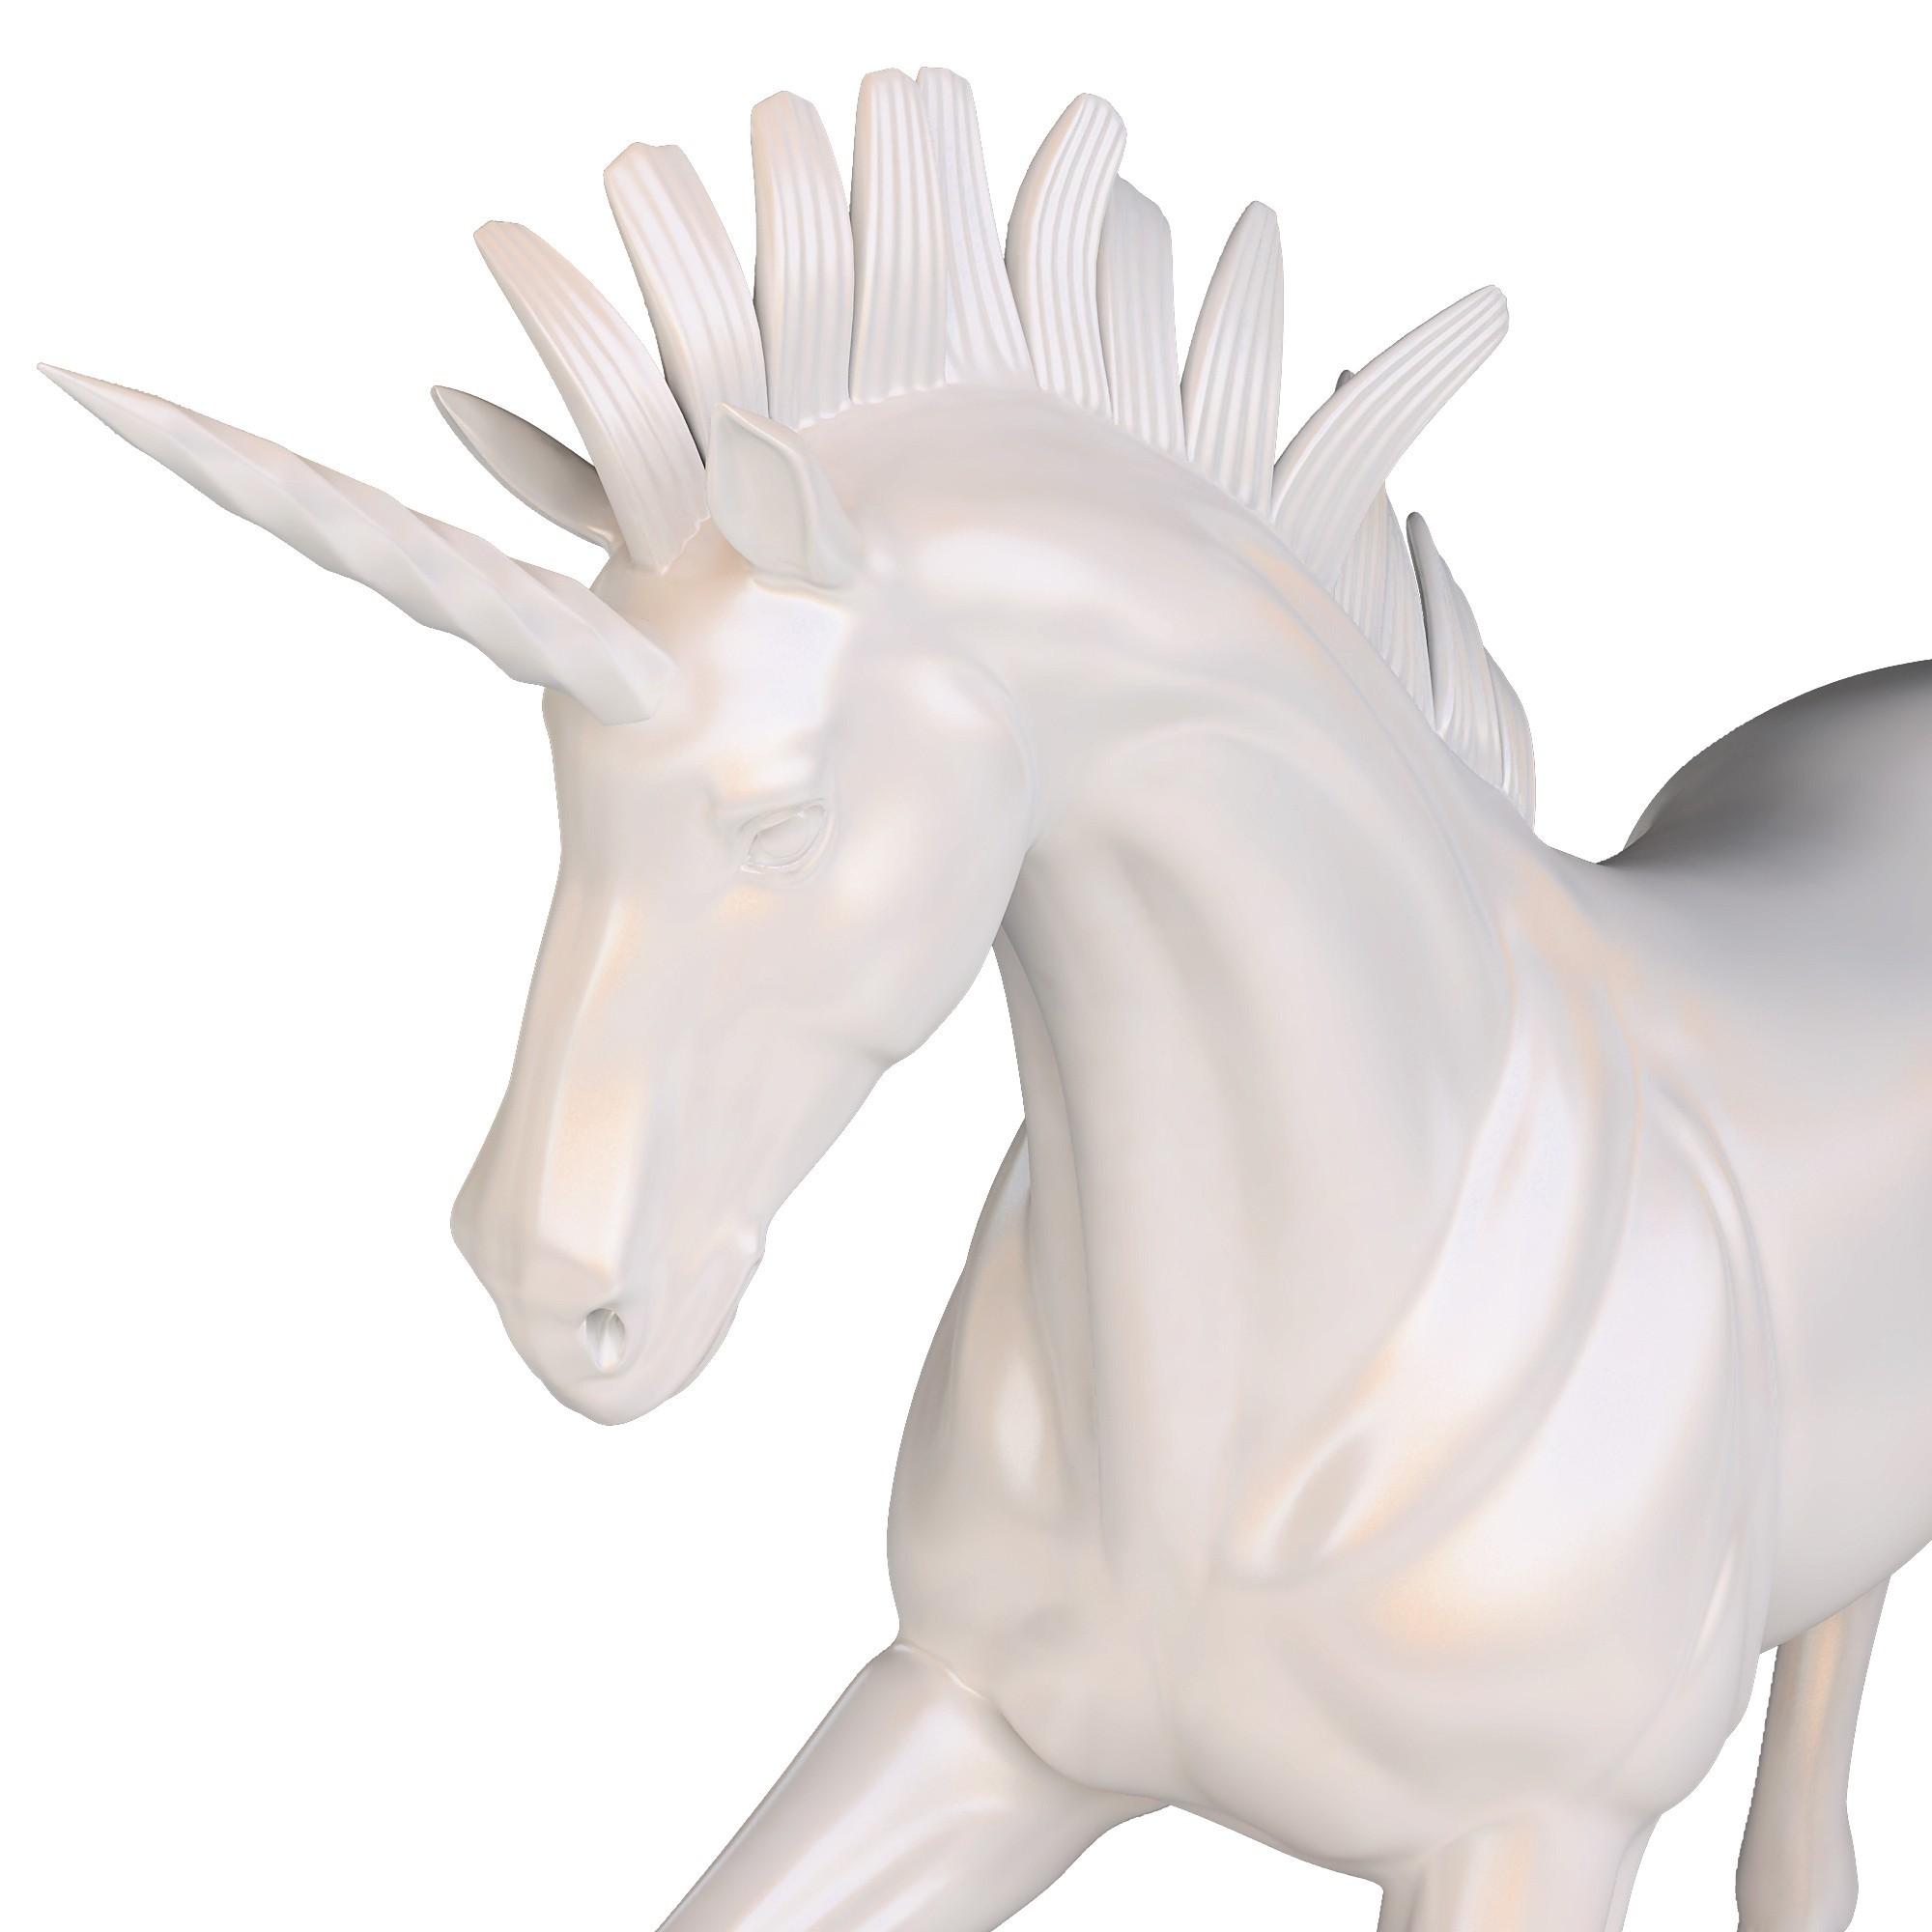 Unicorn 06.jpg Download OBJ file Unicorn Sculpture • 3D printable template, FORMBYTE